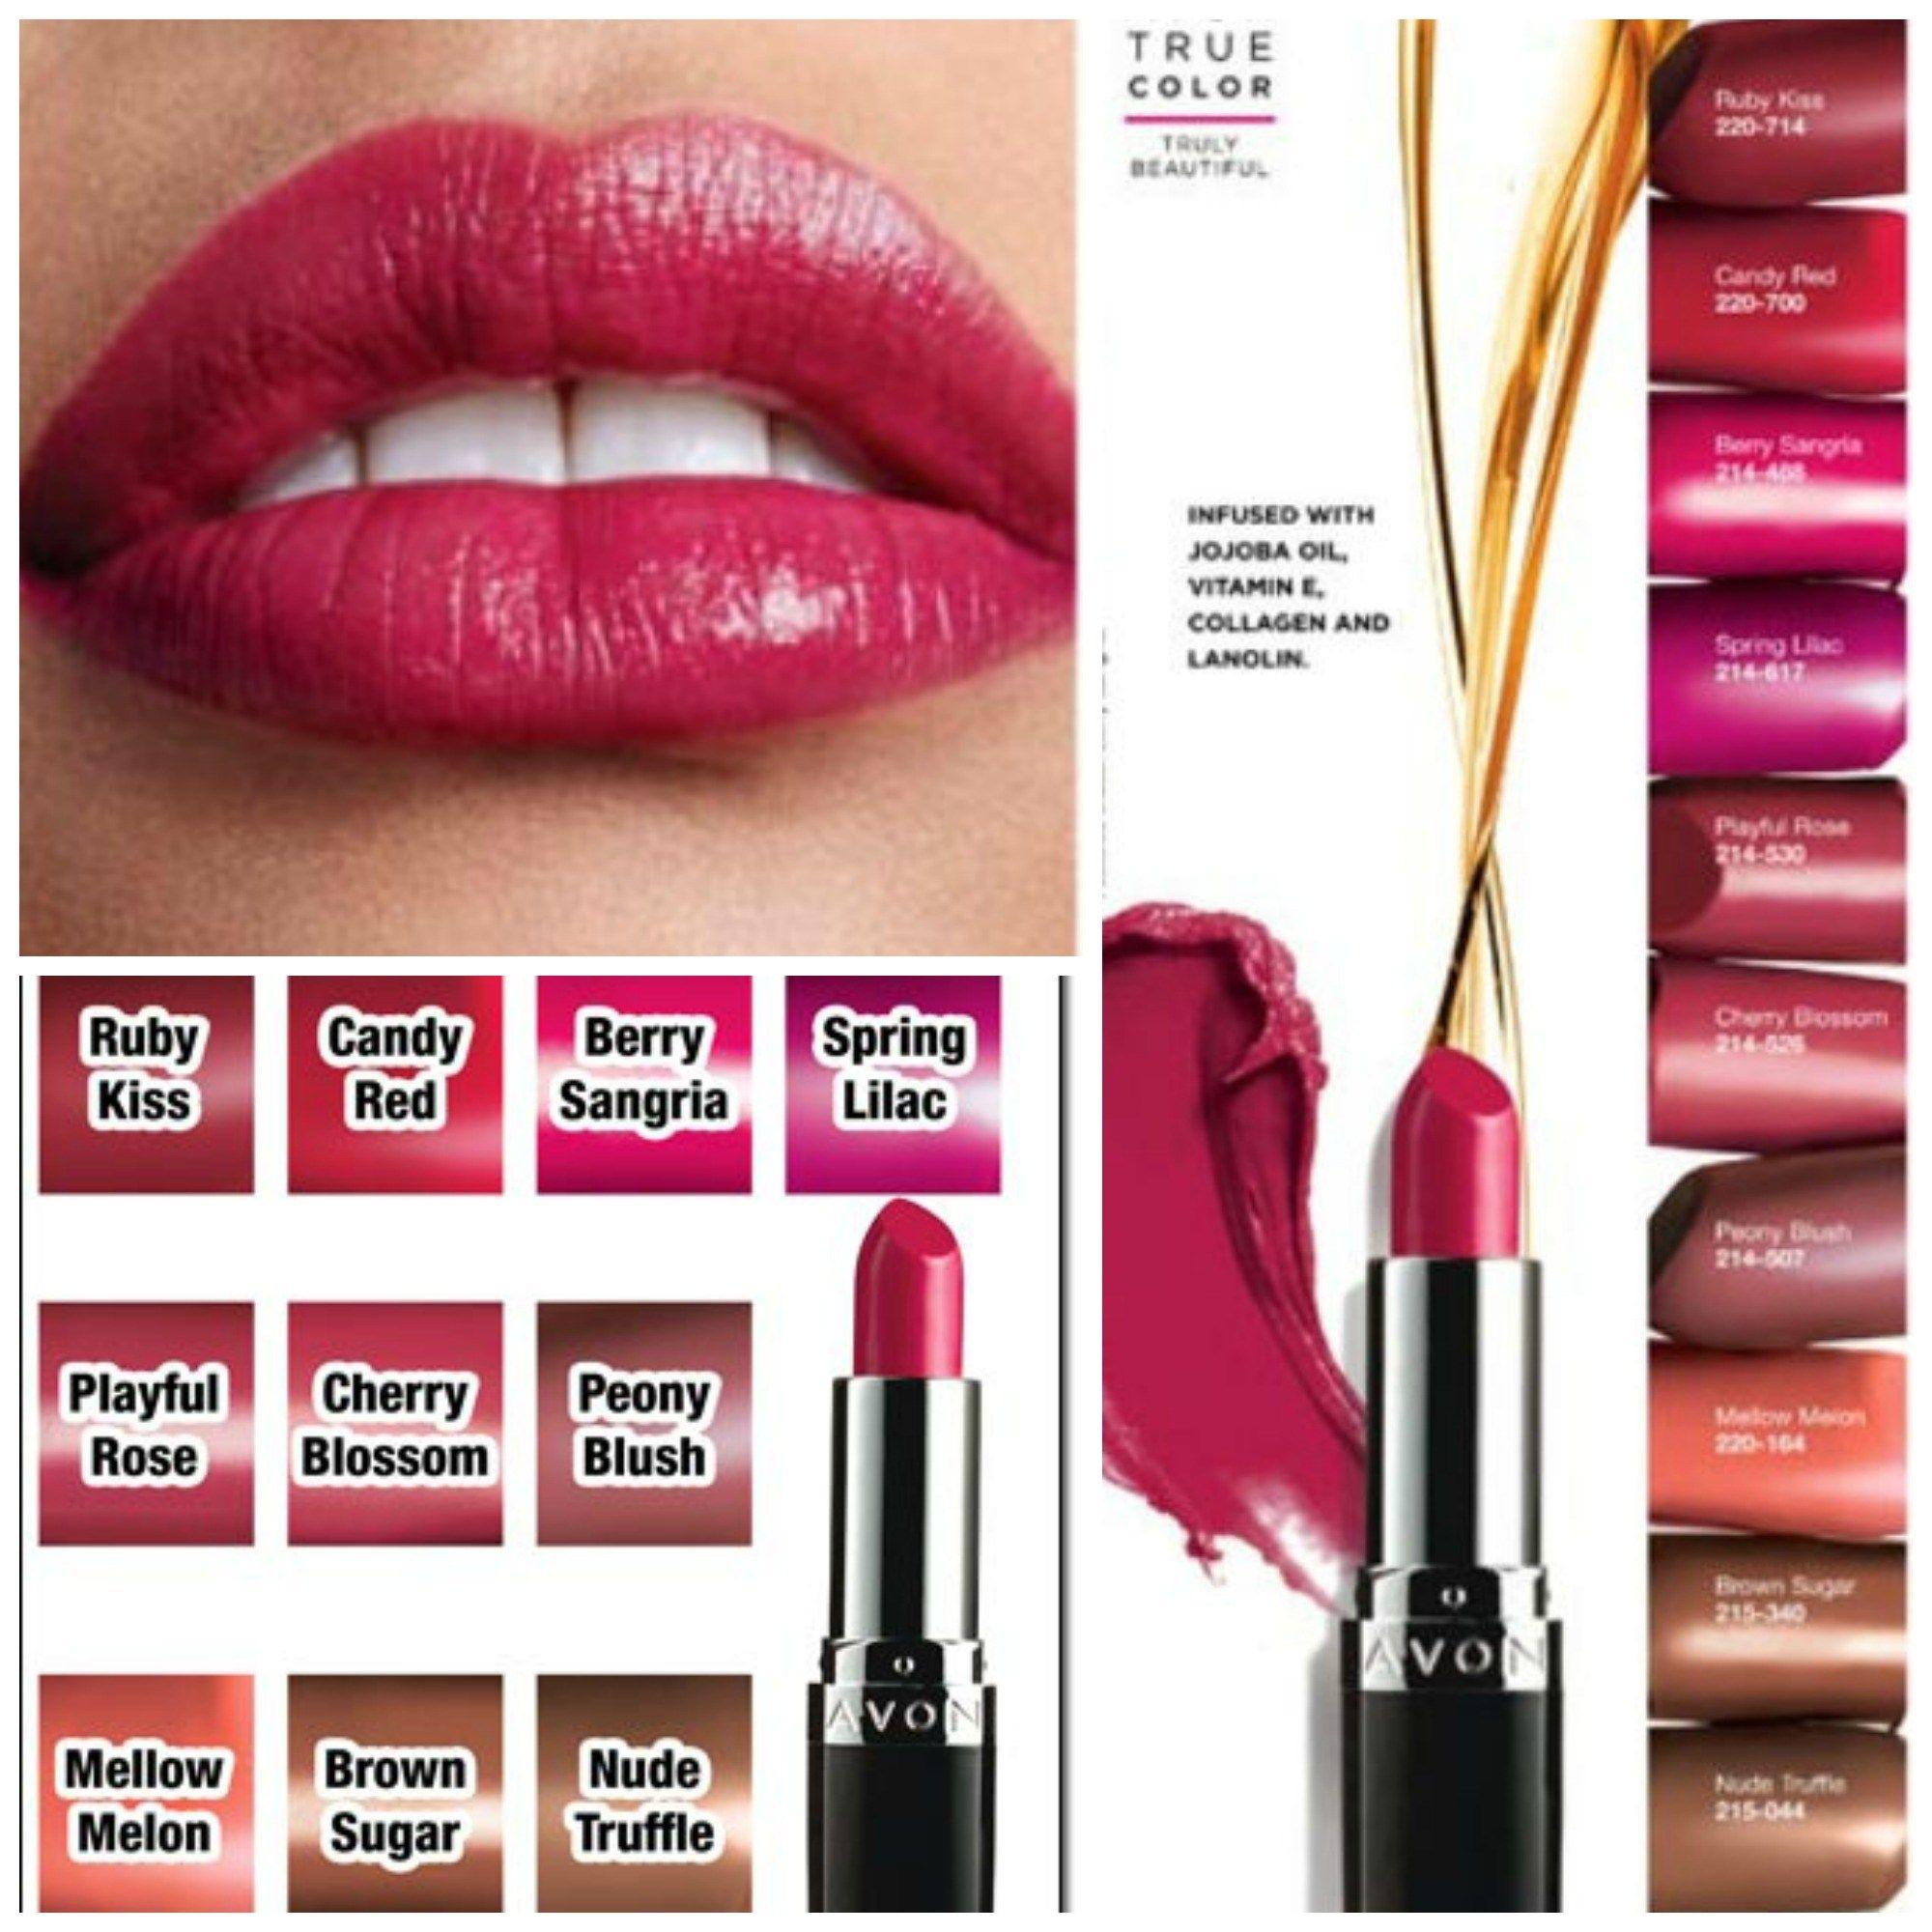 Avon True Color Nourishing Lipstick Avon True